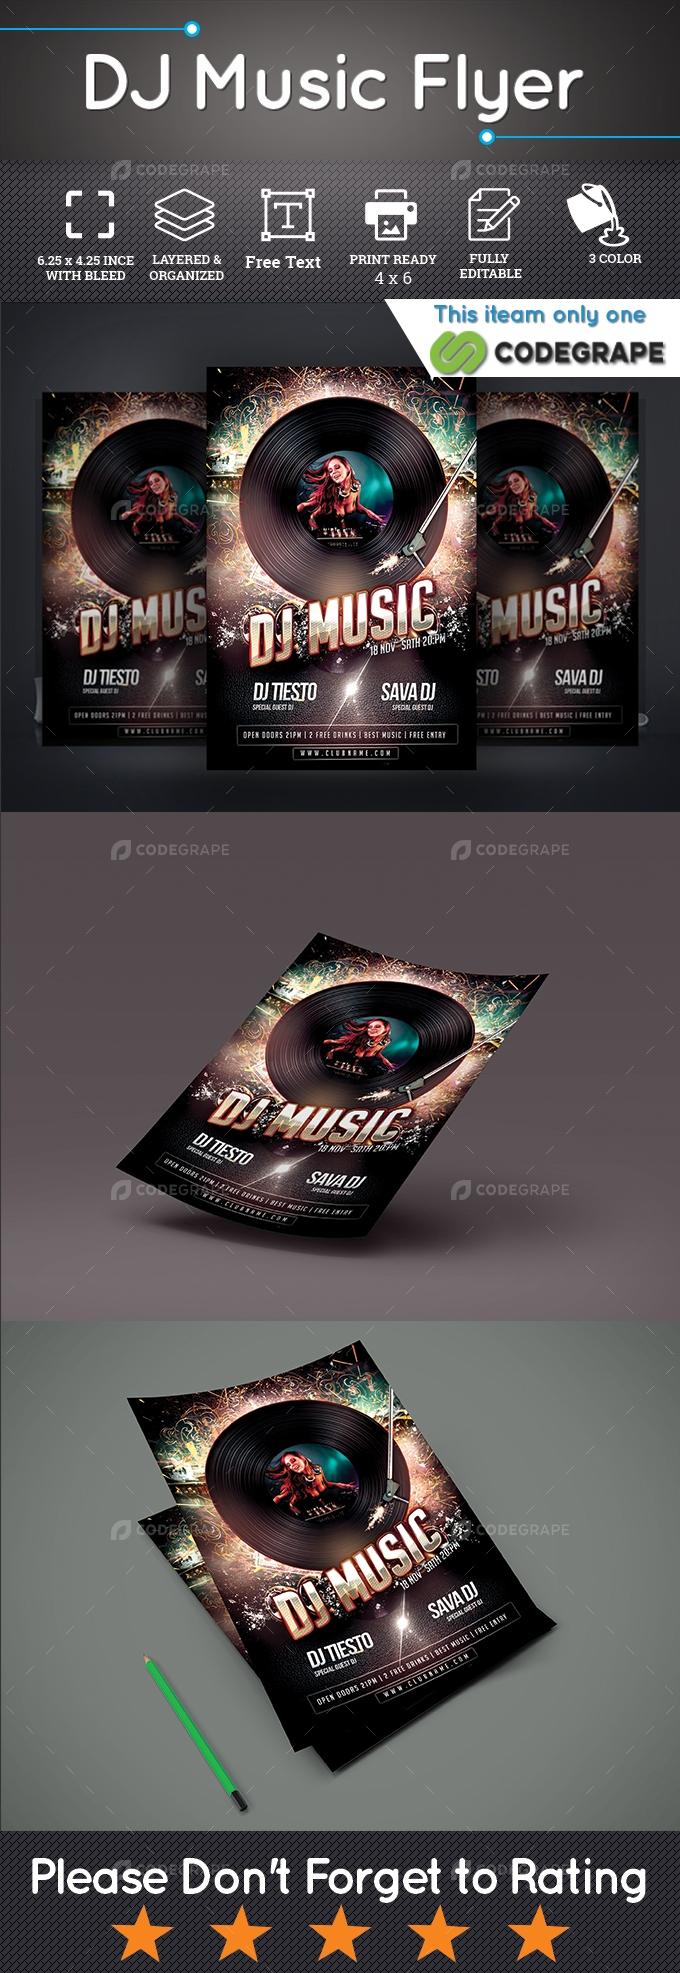 Dj Music Flyer